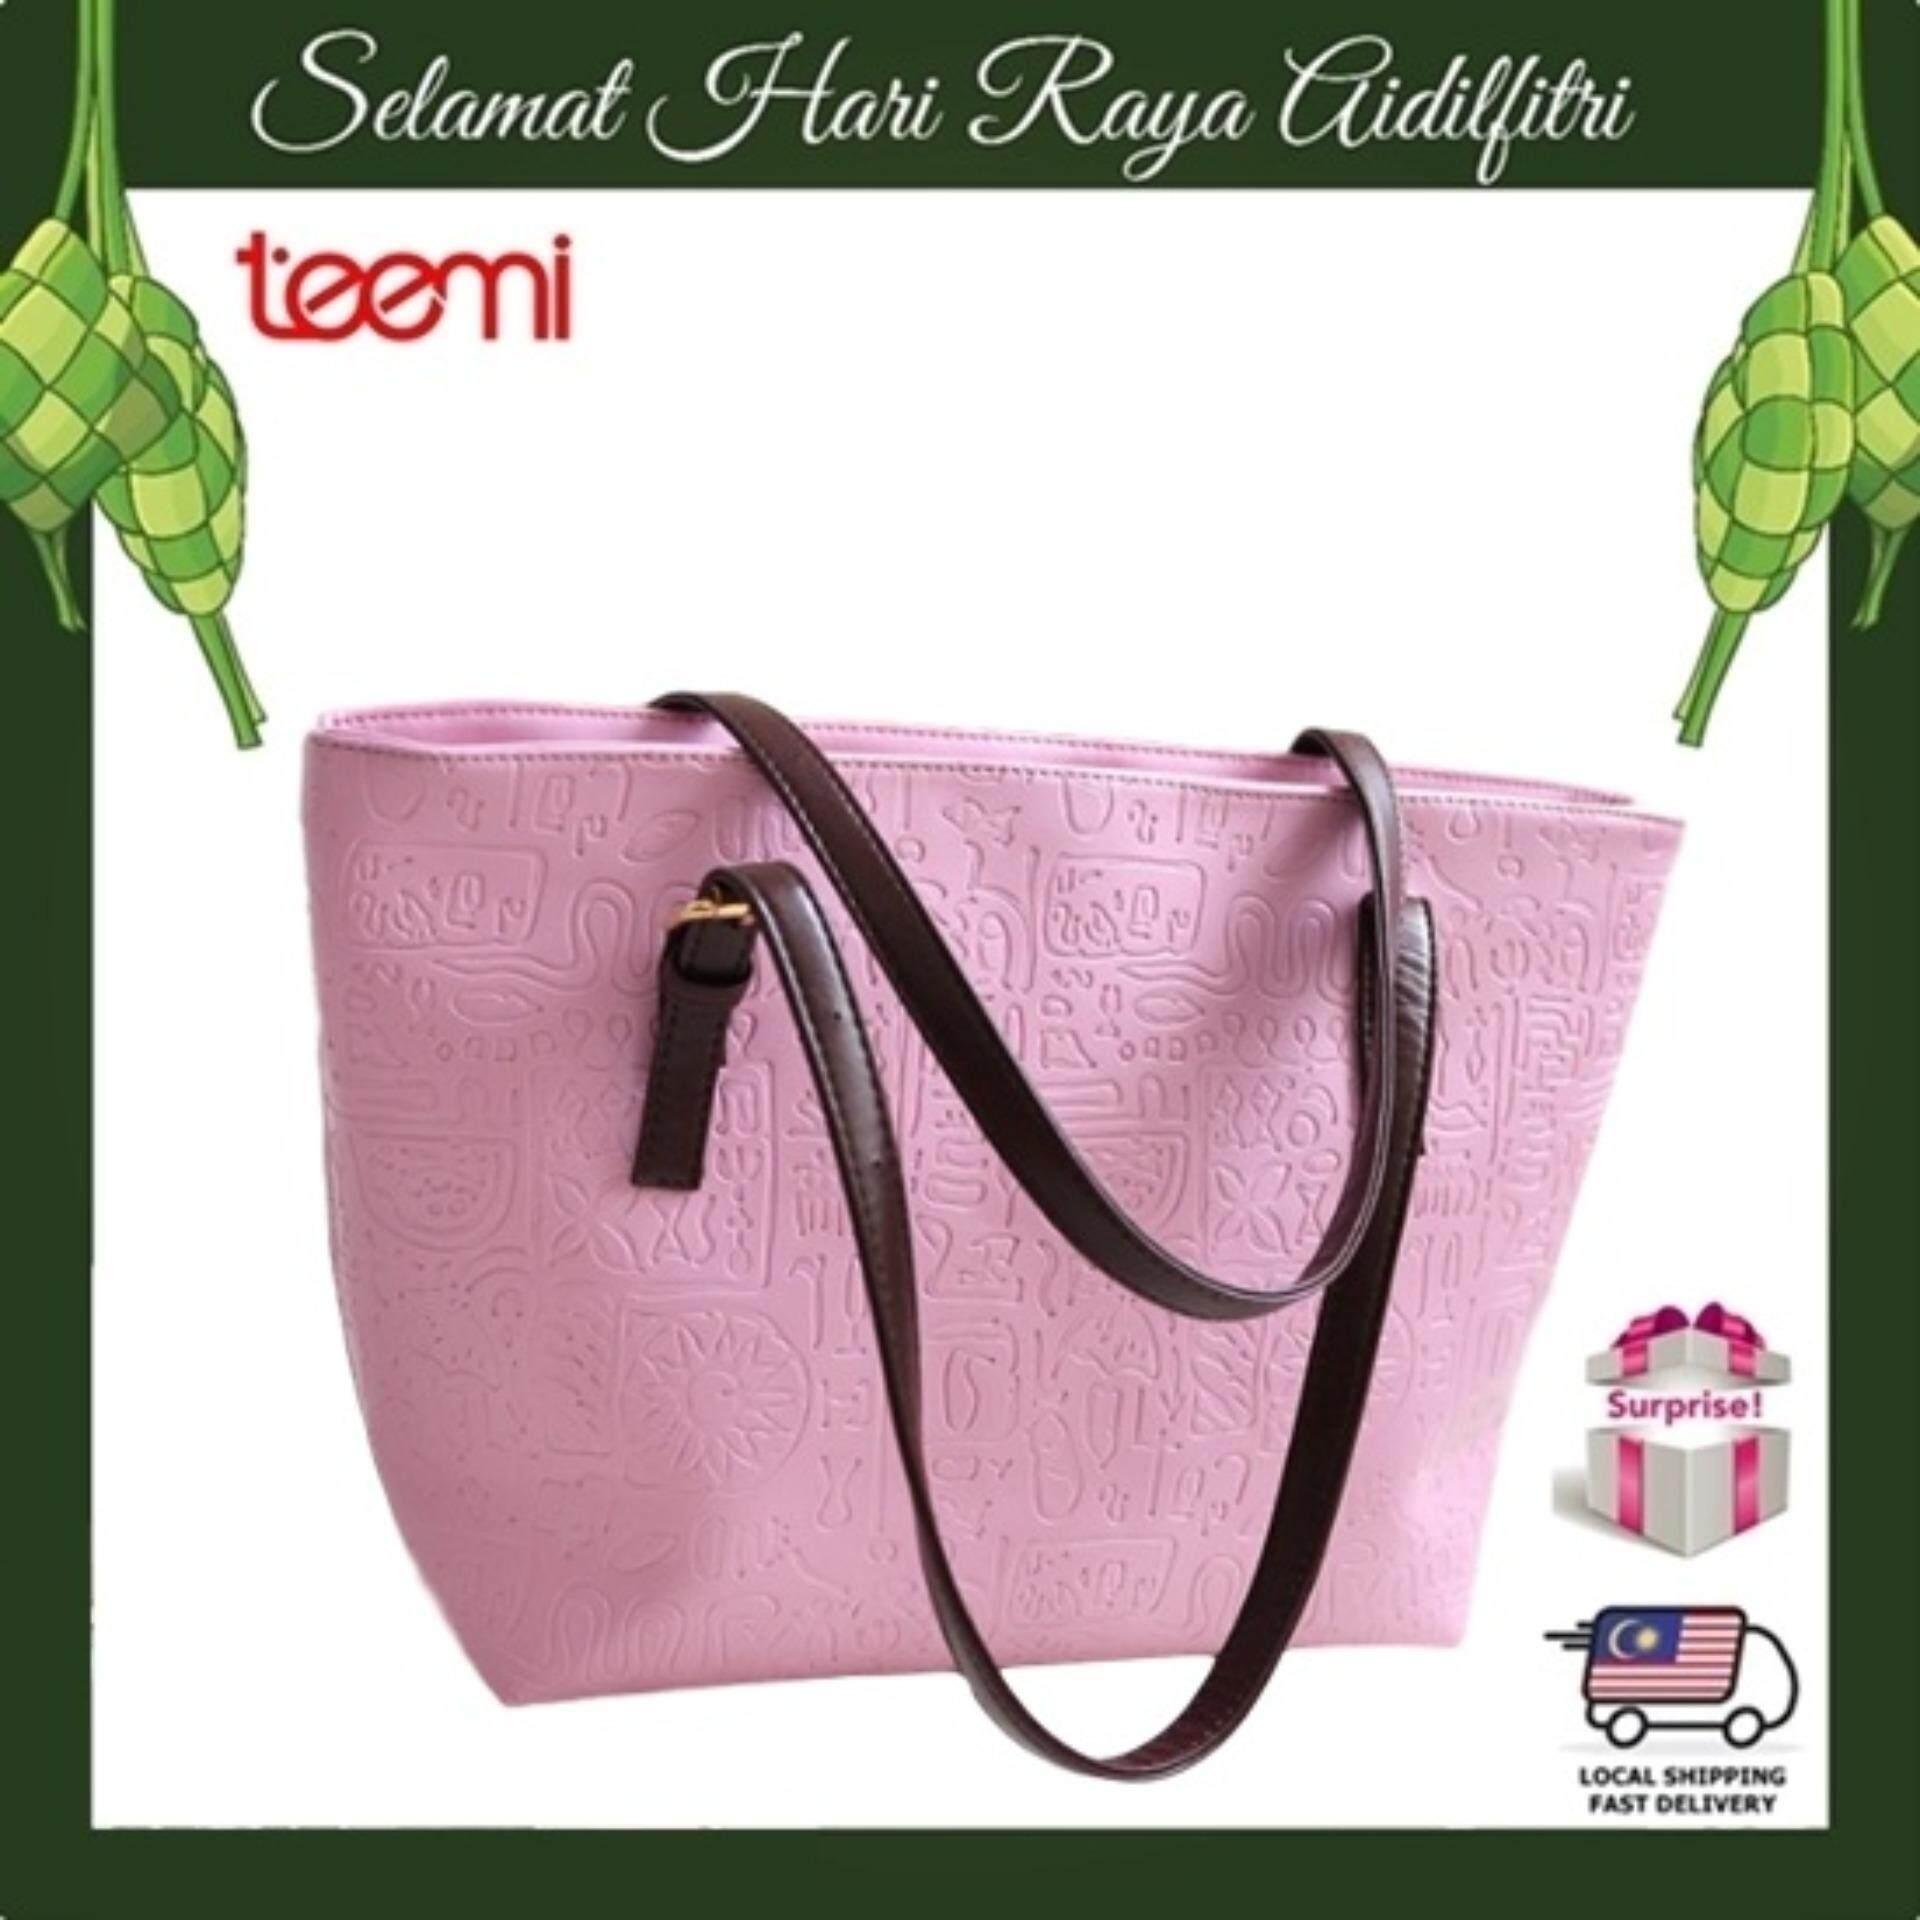 TEEMI Ancient Engraved Symbols Vintage Women PU Leather Large Tote Bag Adjustable Handle Top Zipper - Light Pink